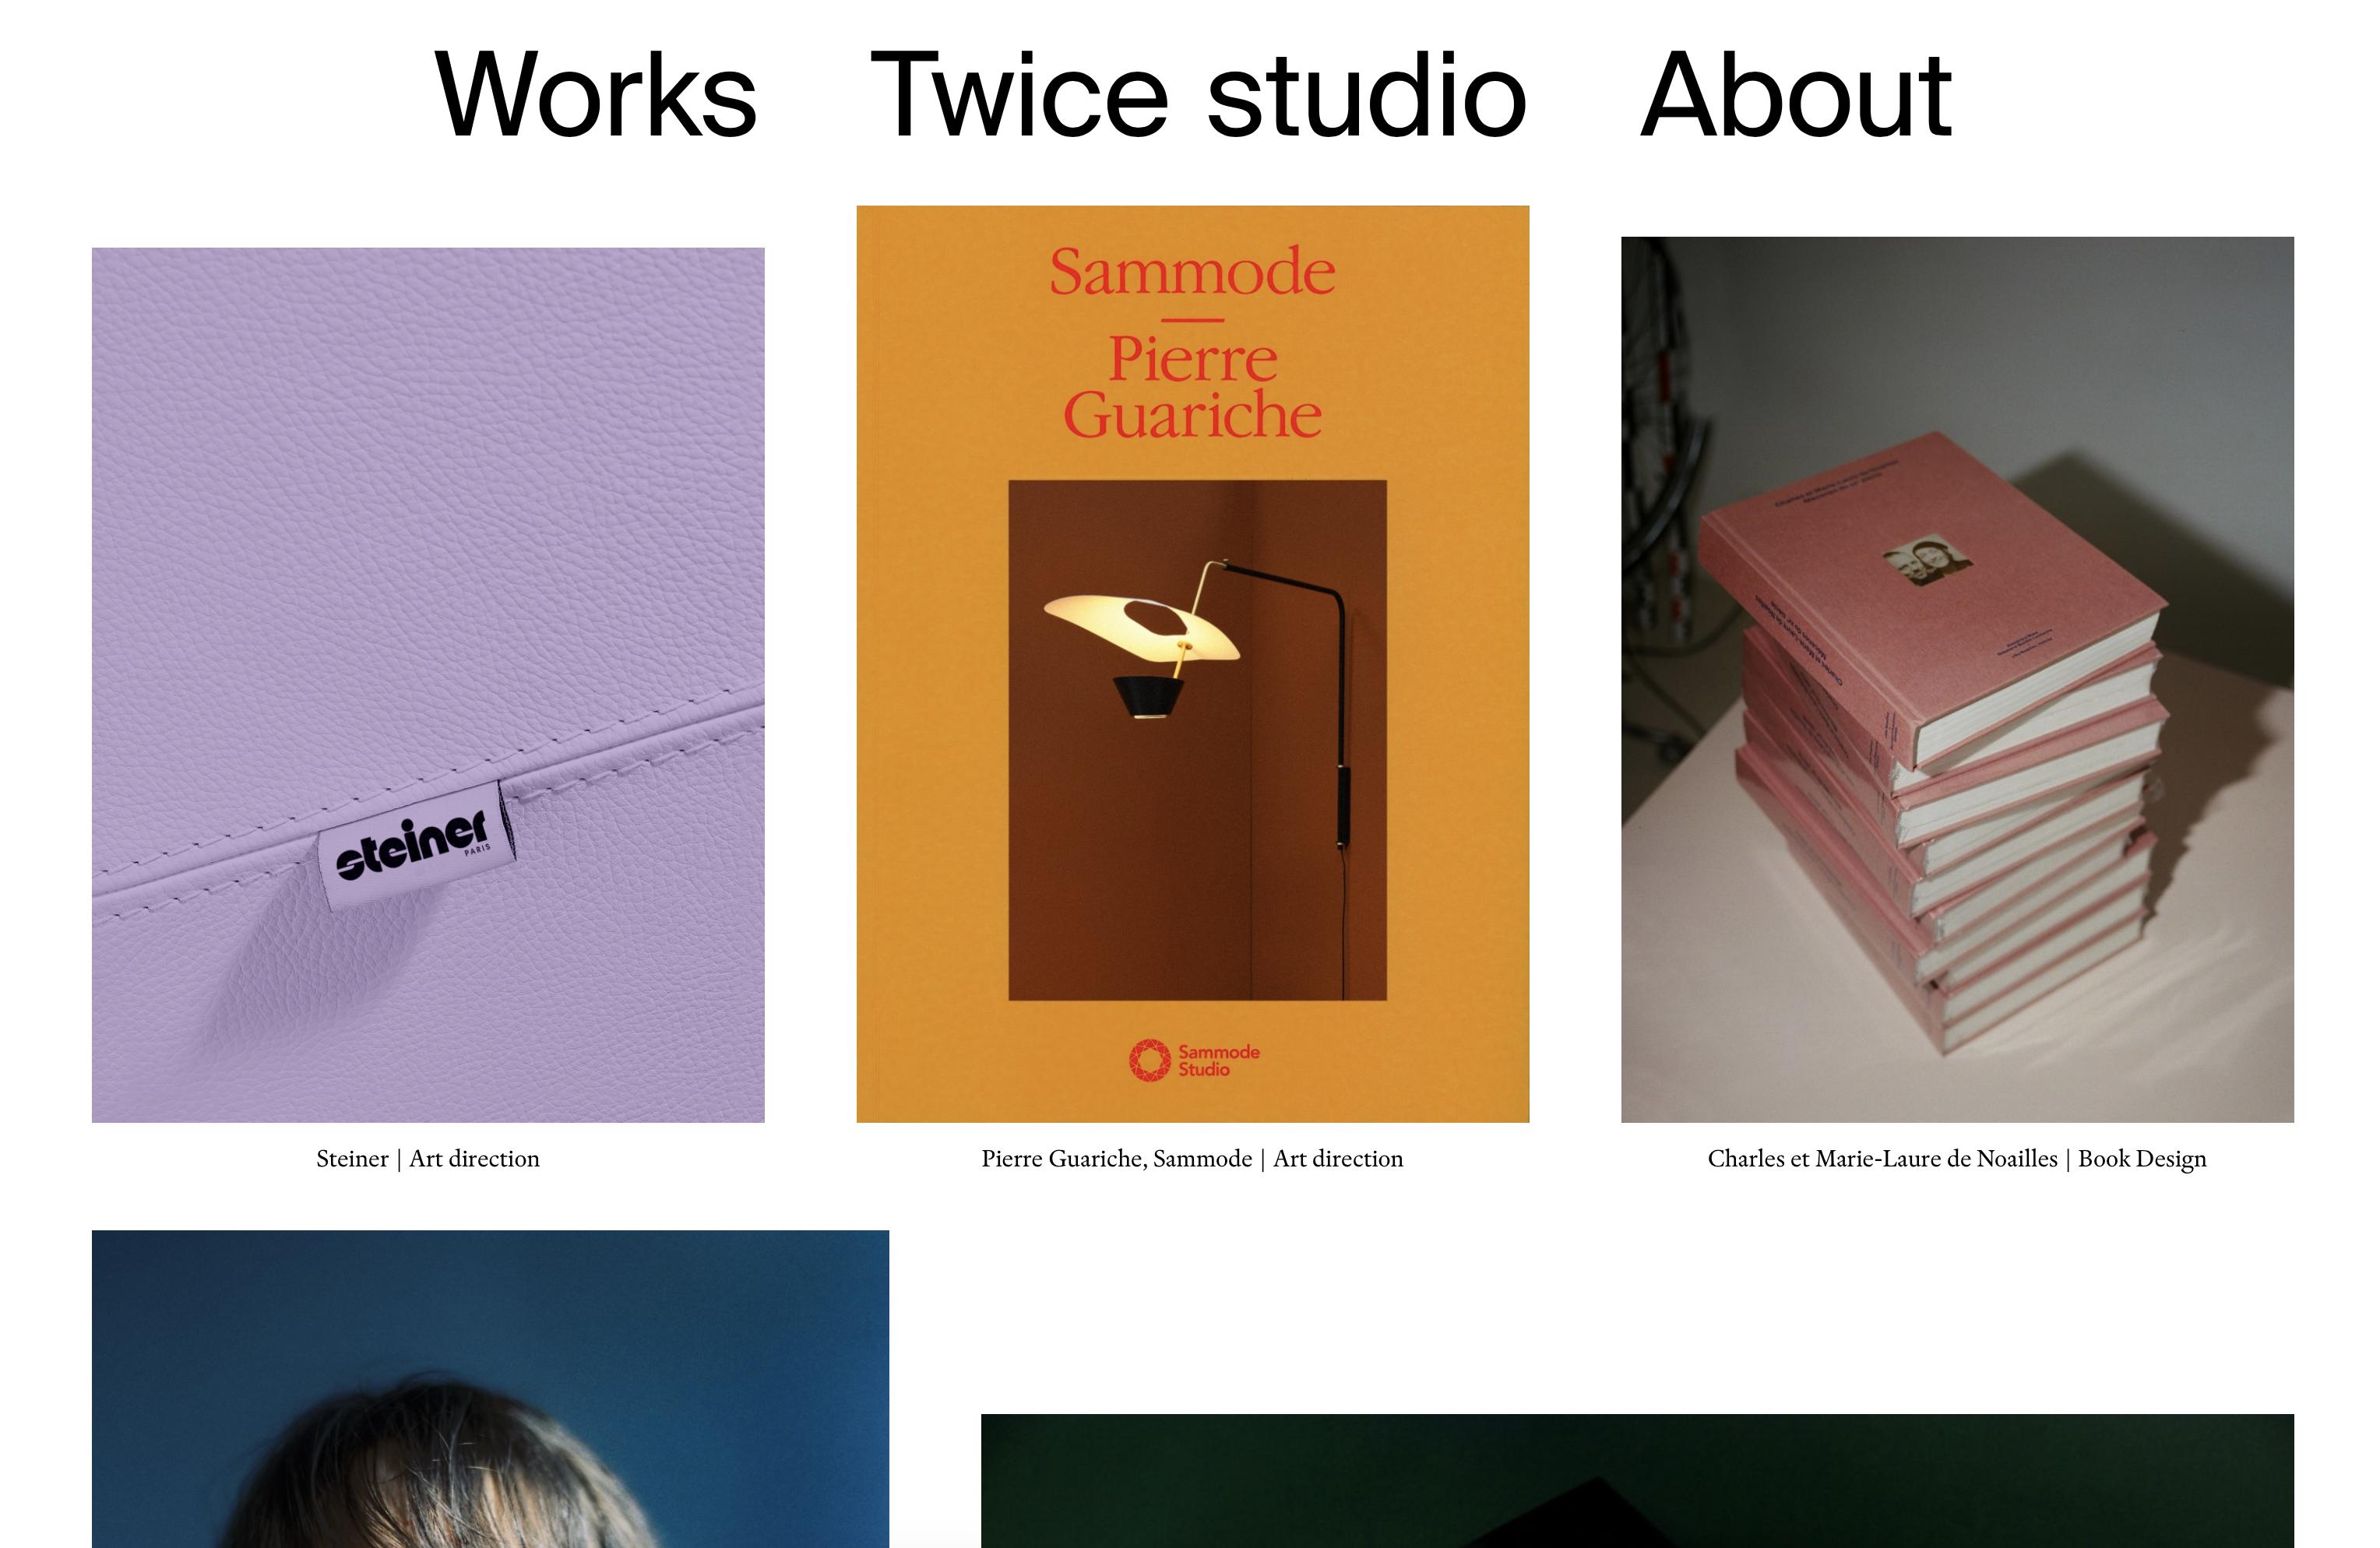 Le nouveau site internet de Twice Studio